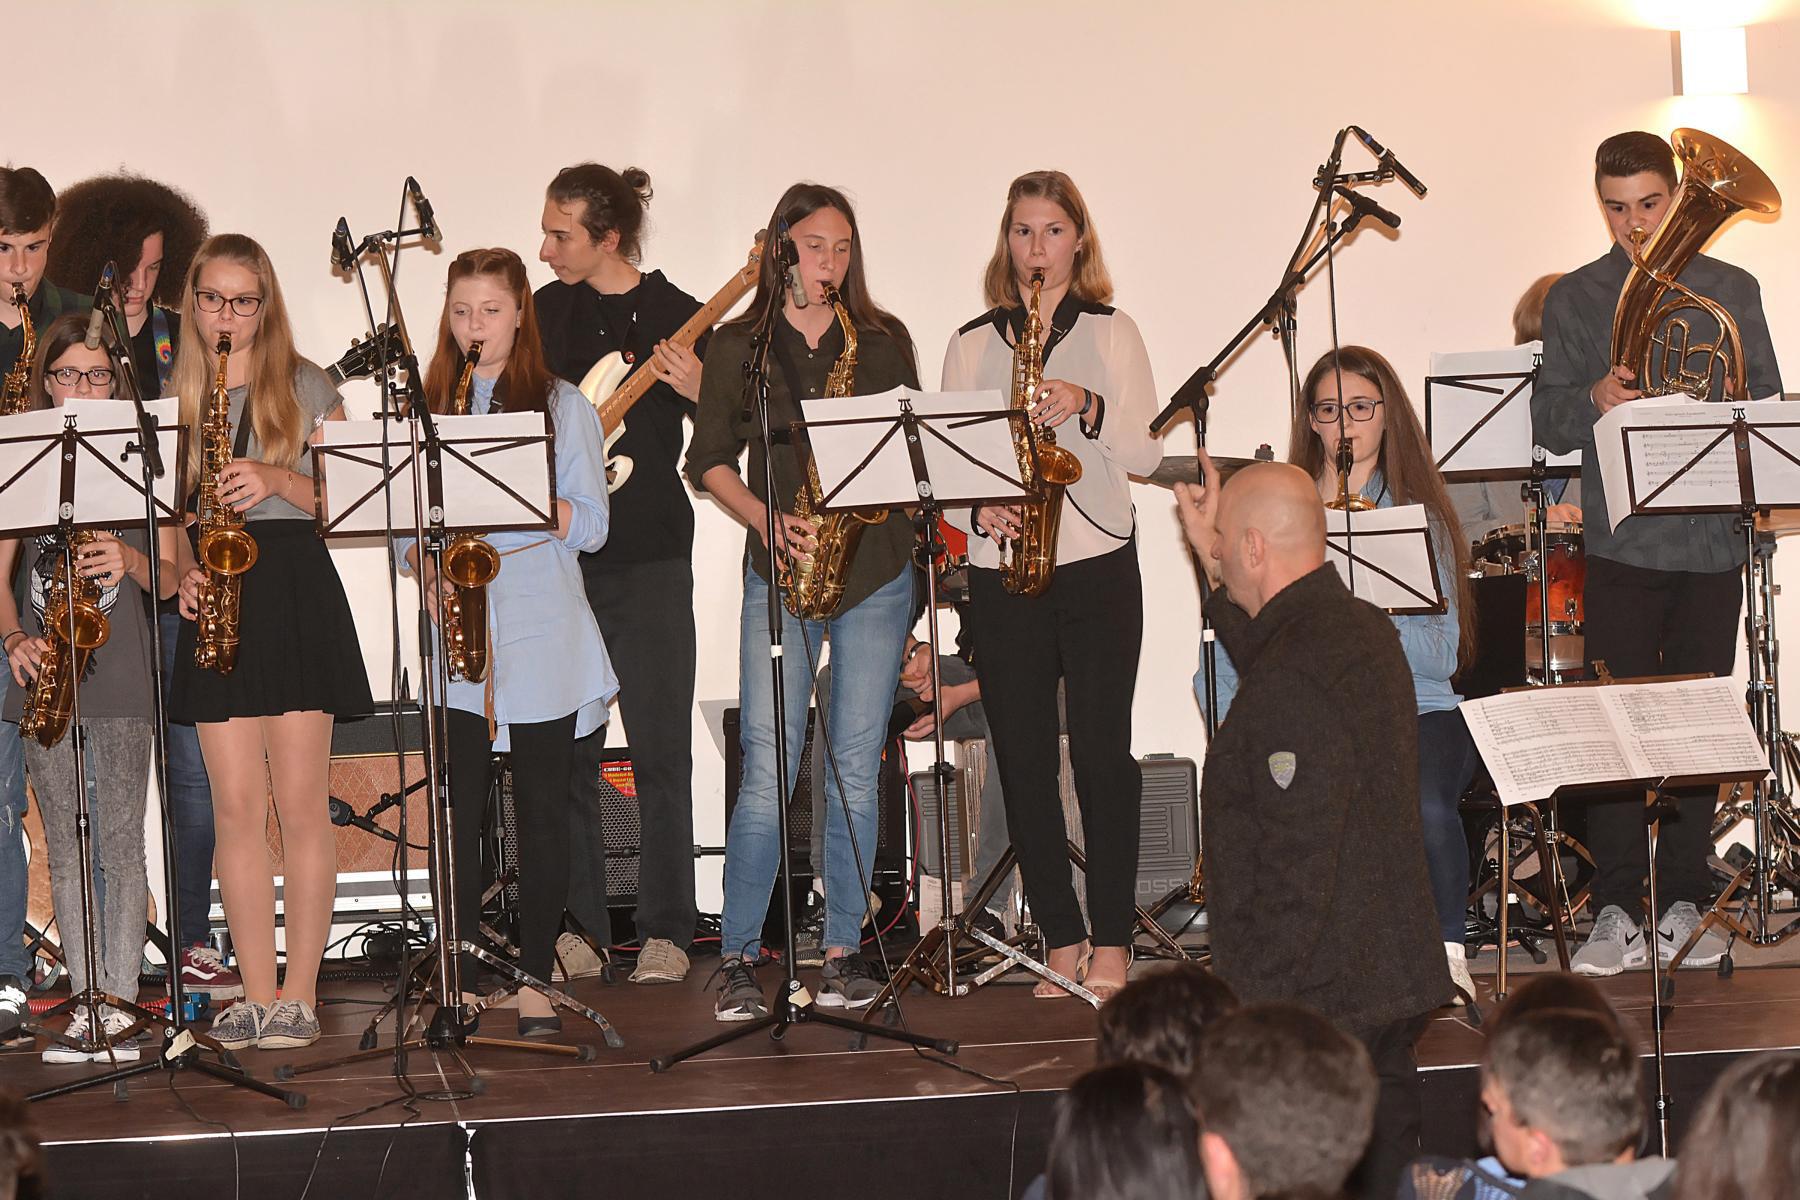 Borgkonzert BORG Band Foto Barth (1800x1200)